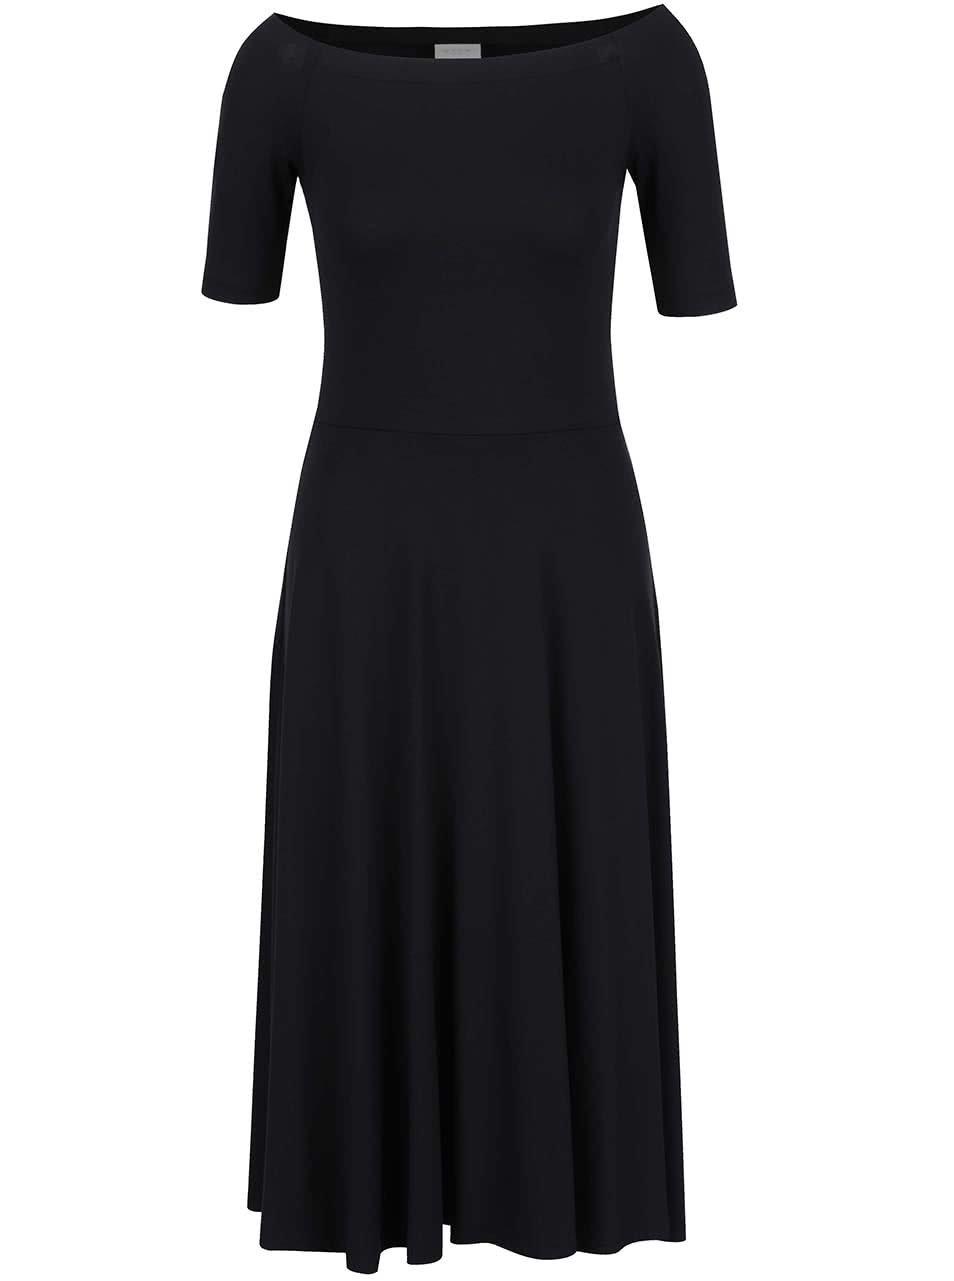 Černé šaty s lodičkovým výstřihem VILA Saskia